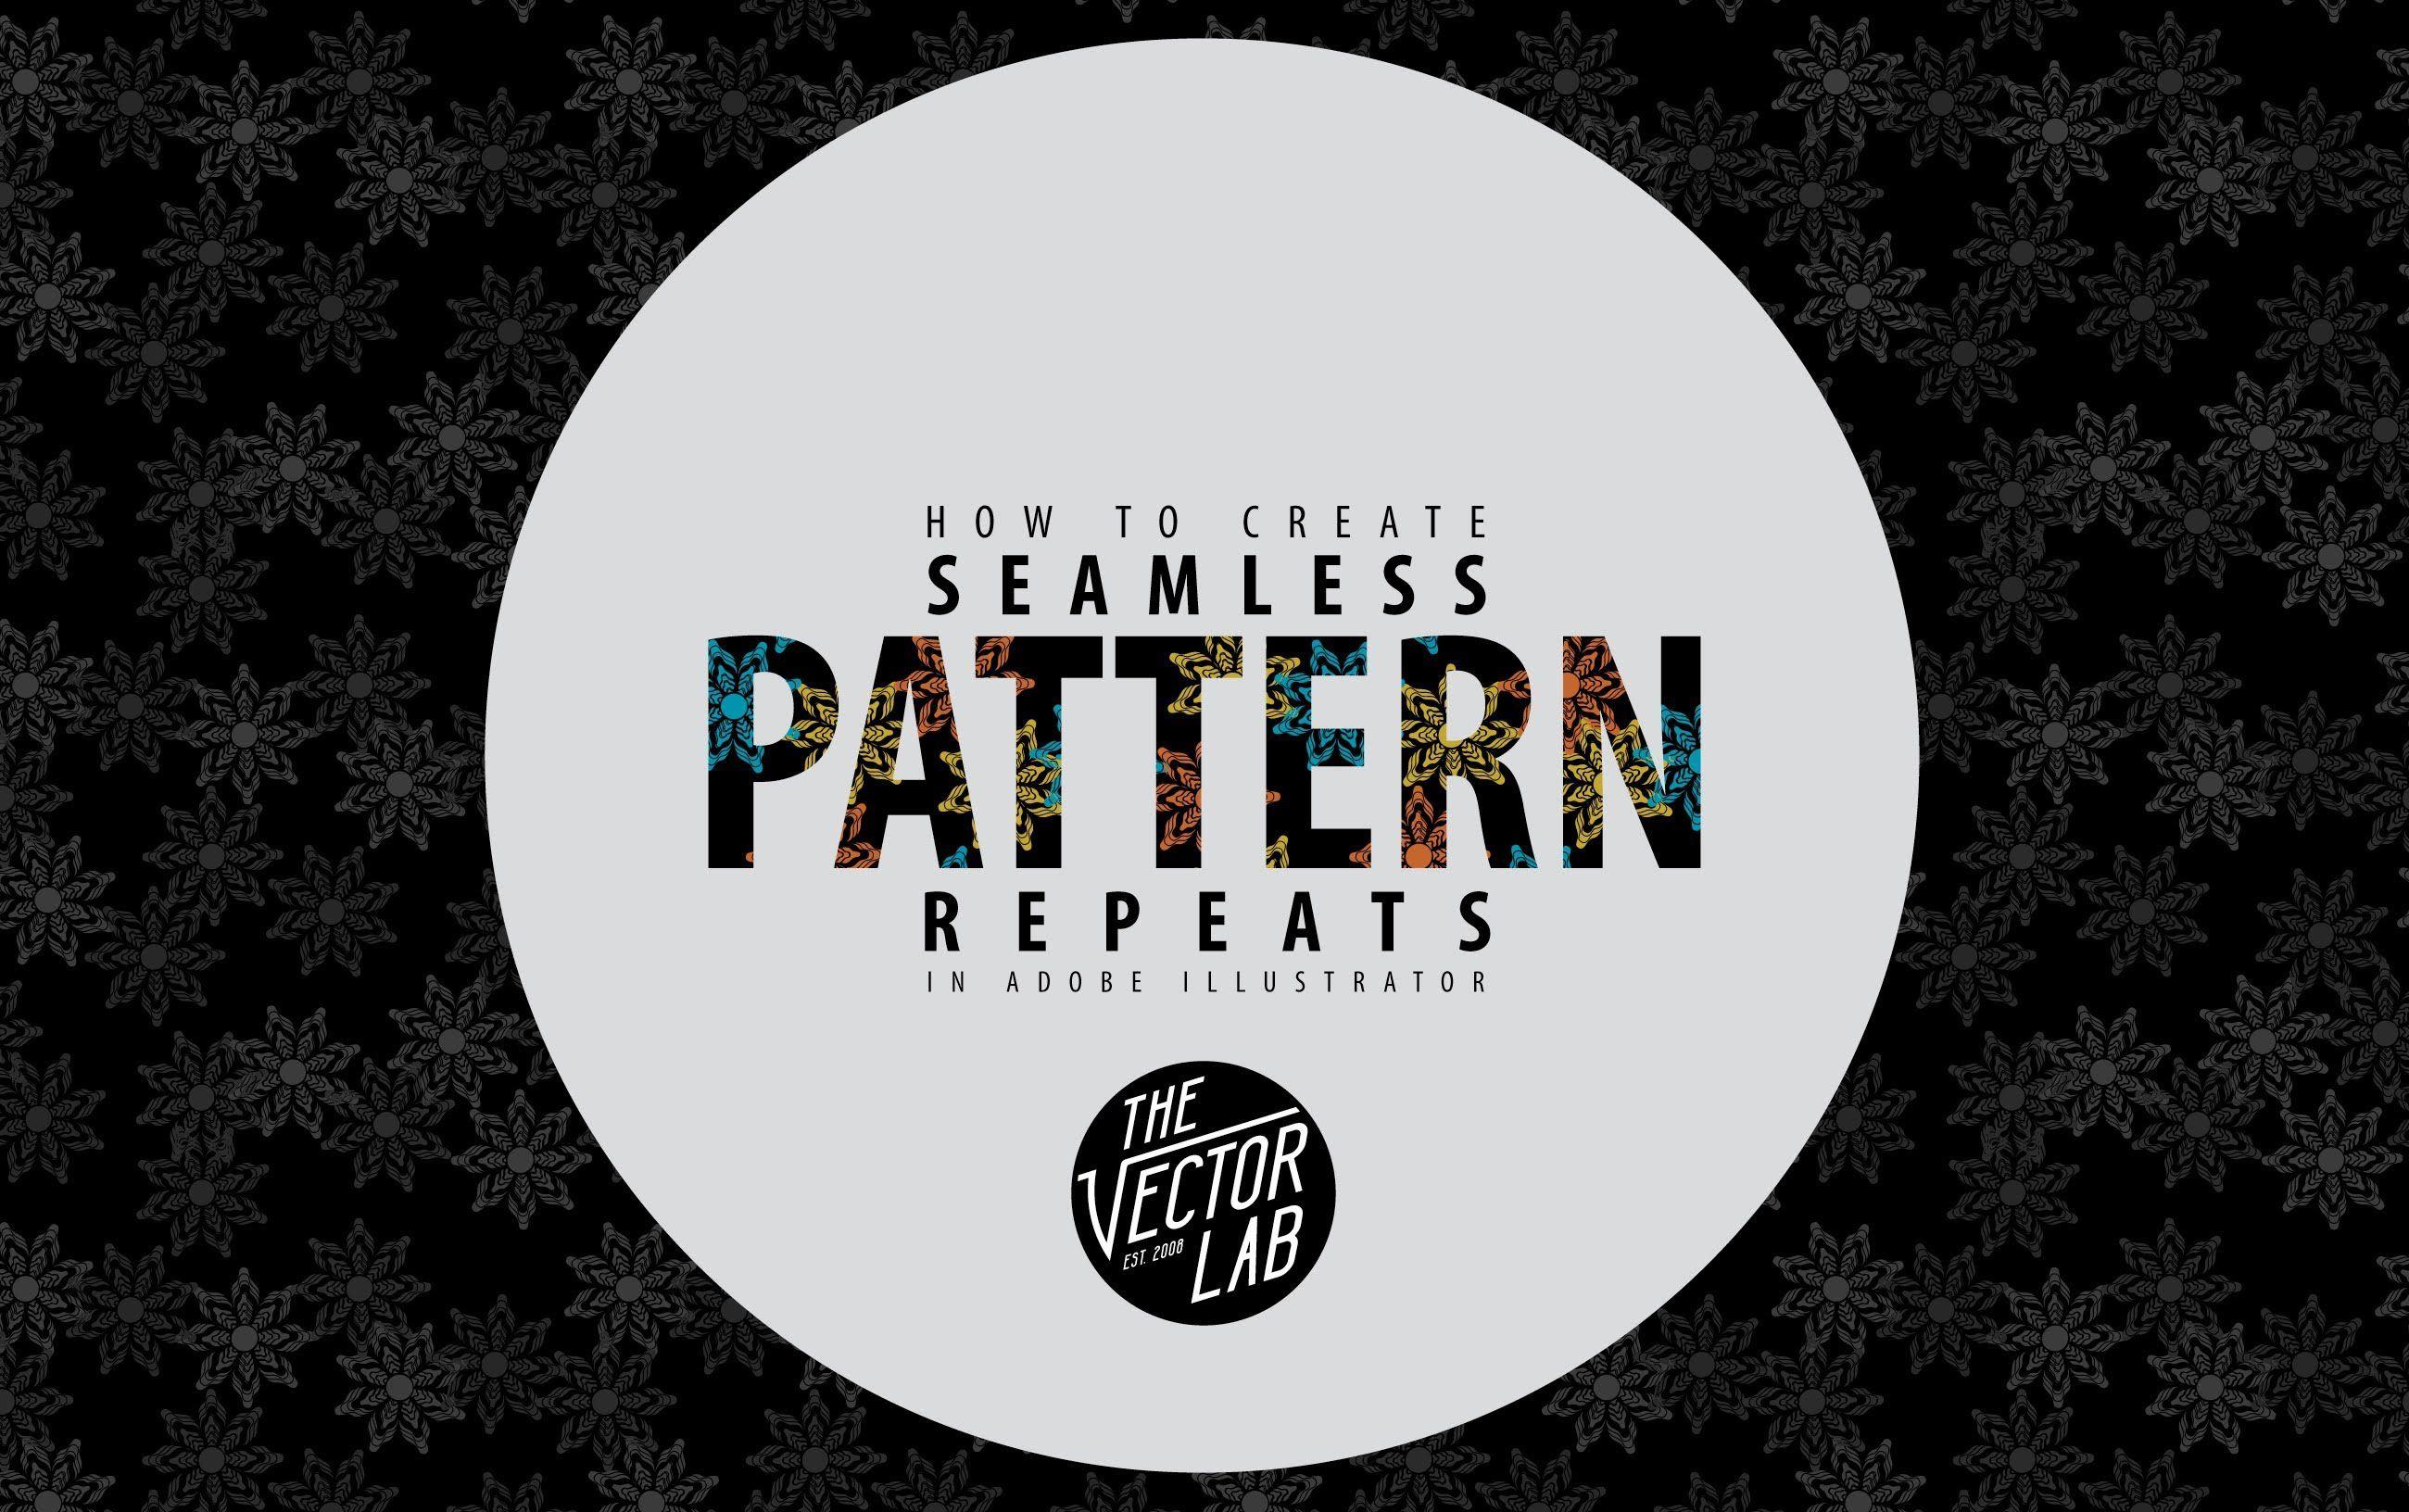 Make seamless patterns in adobe illustrator free download of make seamless patterns in adobe illustrator free download of graphic design launch kit http baditri Image collections